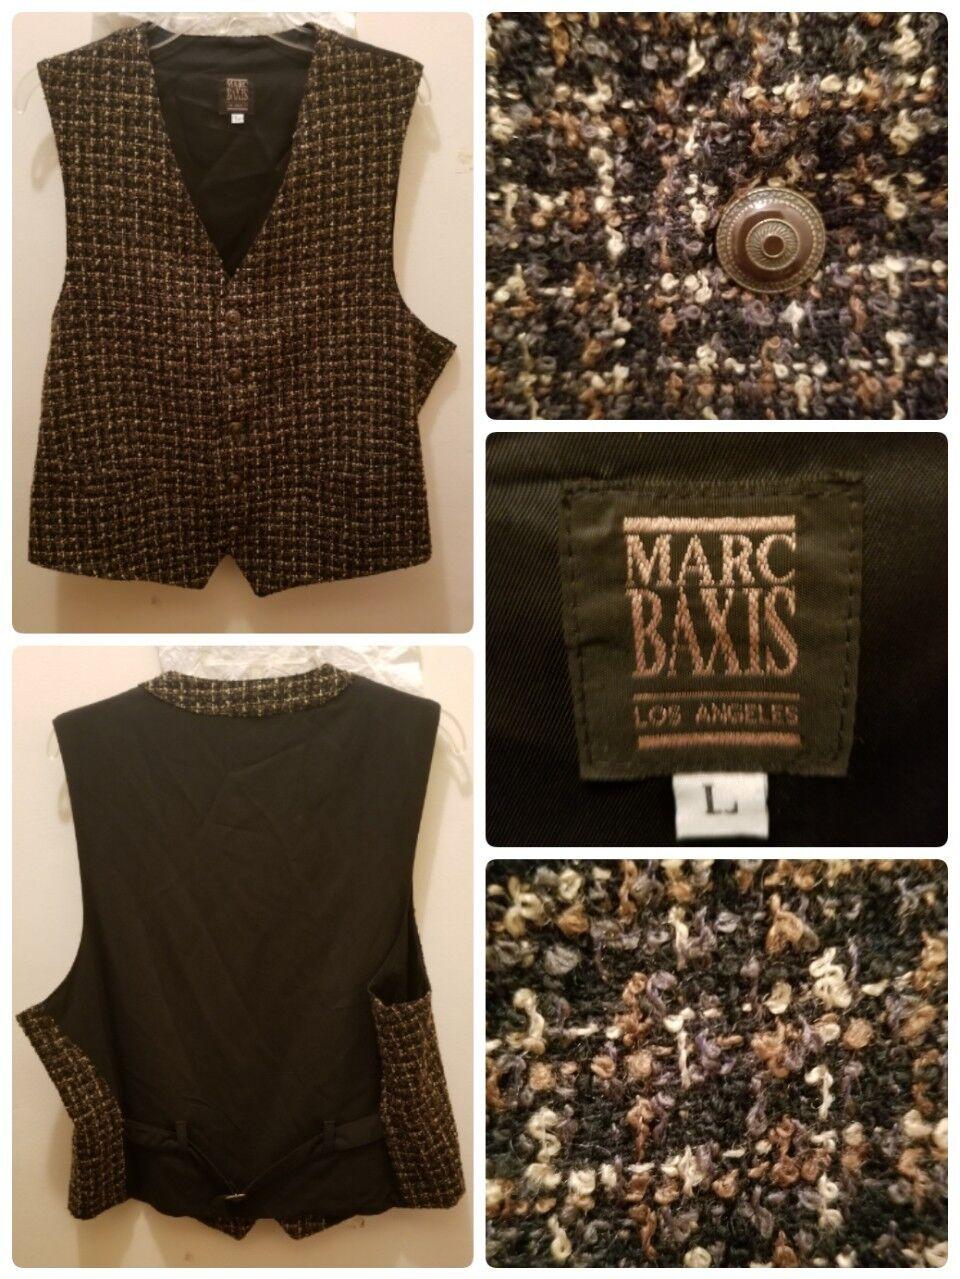 MARC BAXIS Los Angeles Vest Waistcoat Größe Large Wool Blend Lined Geometric USA